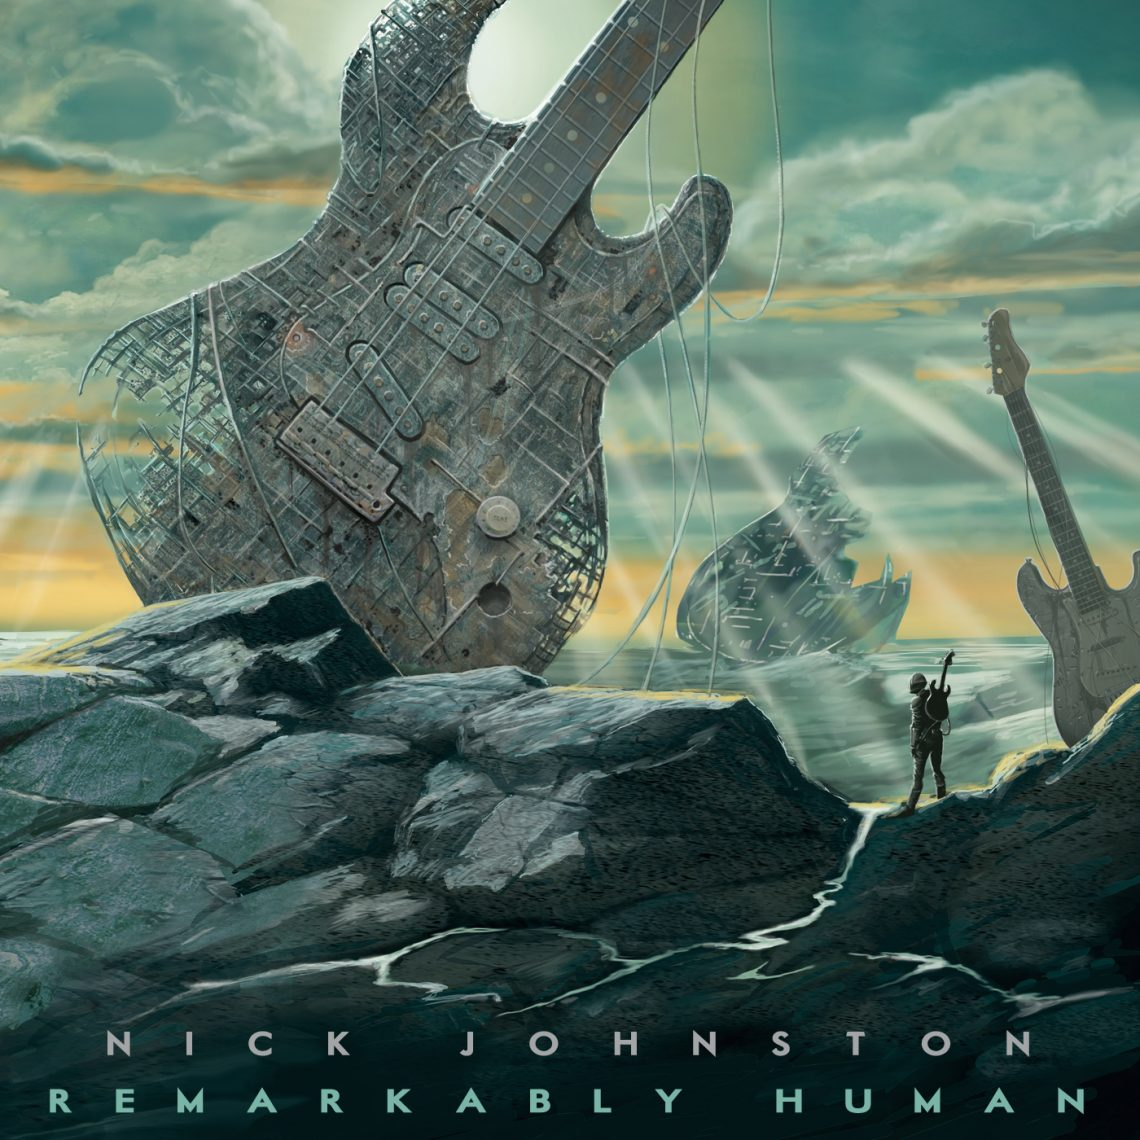 Nick Johnston – Remarkably Human